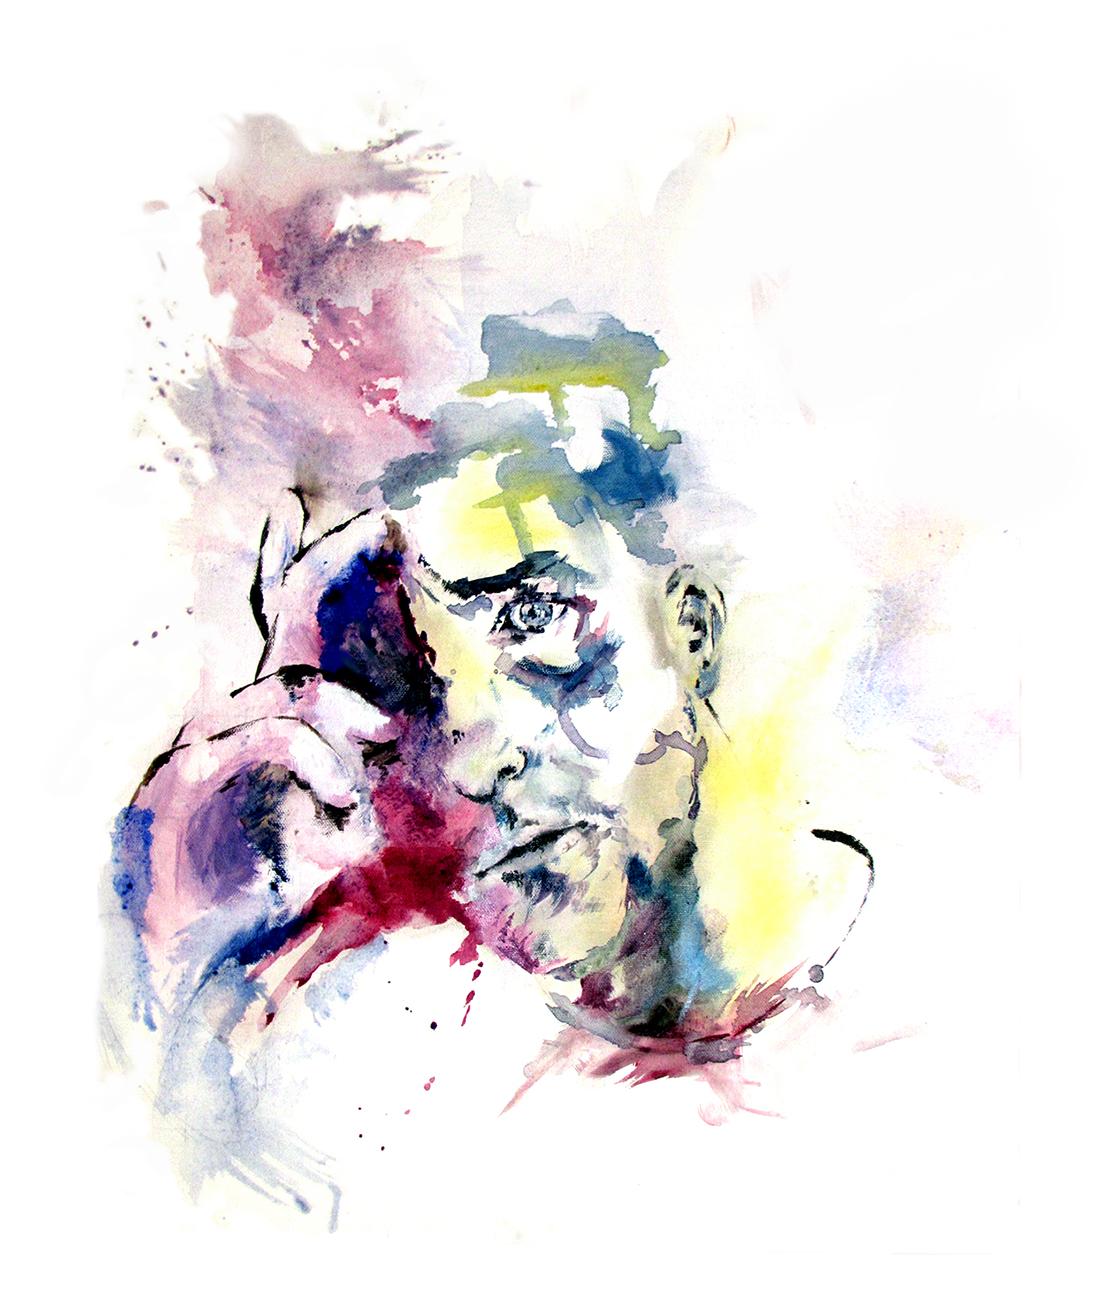 self portrait 2013 (oil + acrylic)